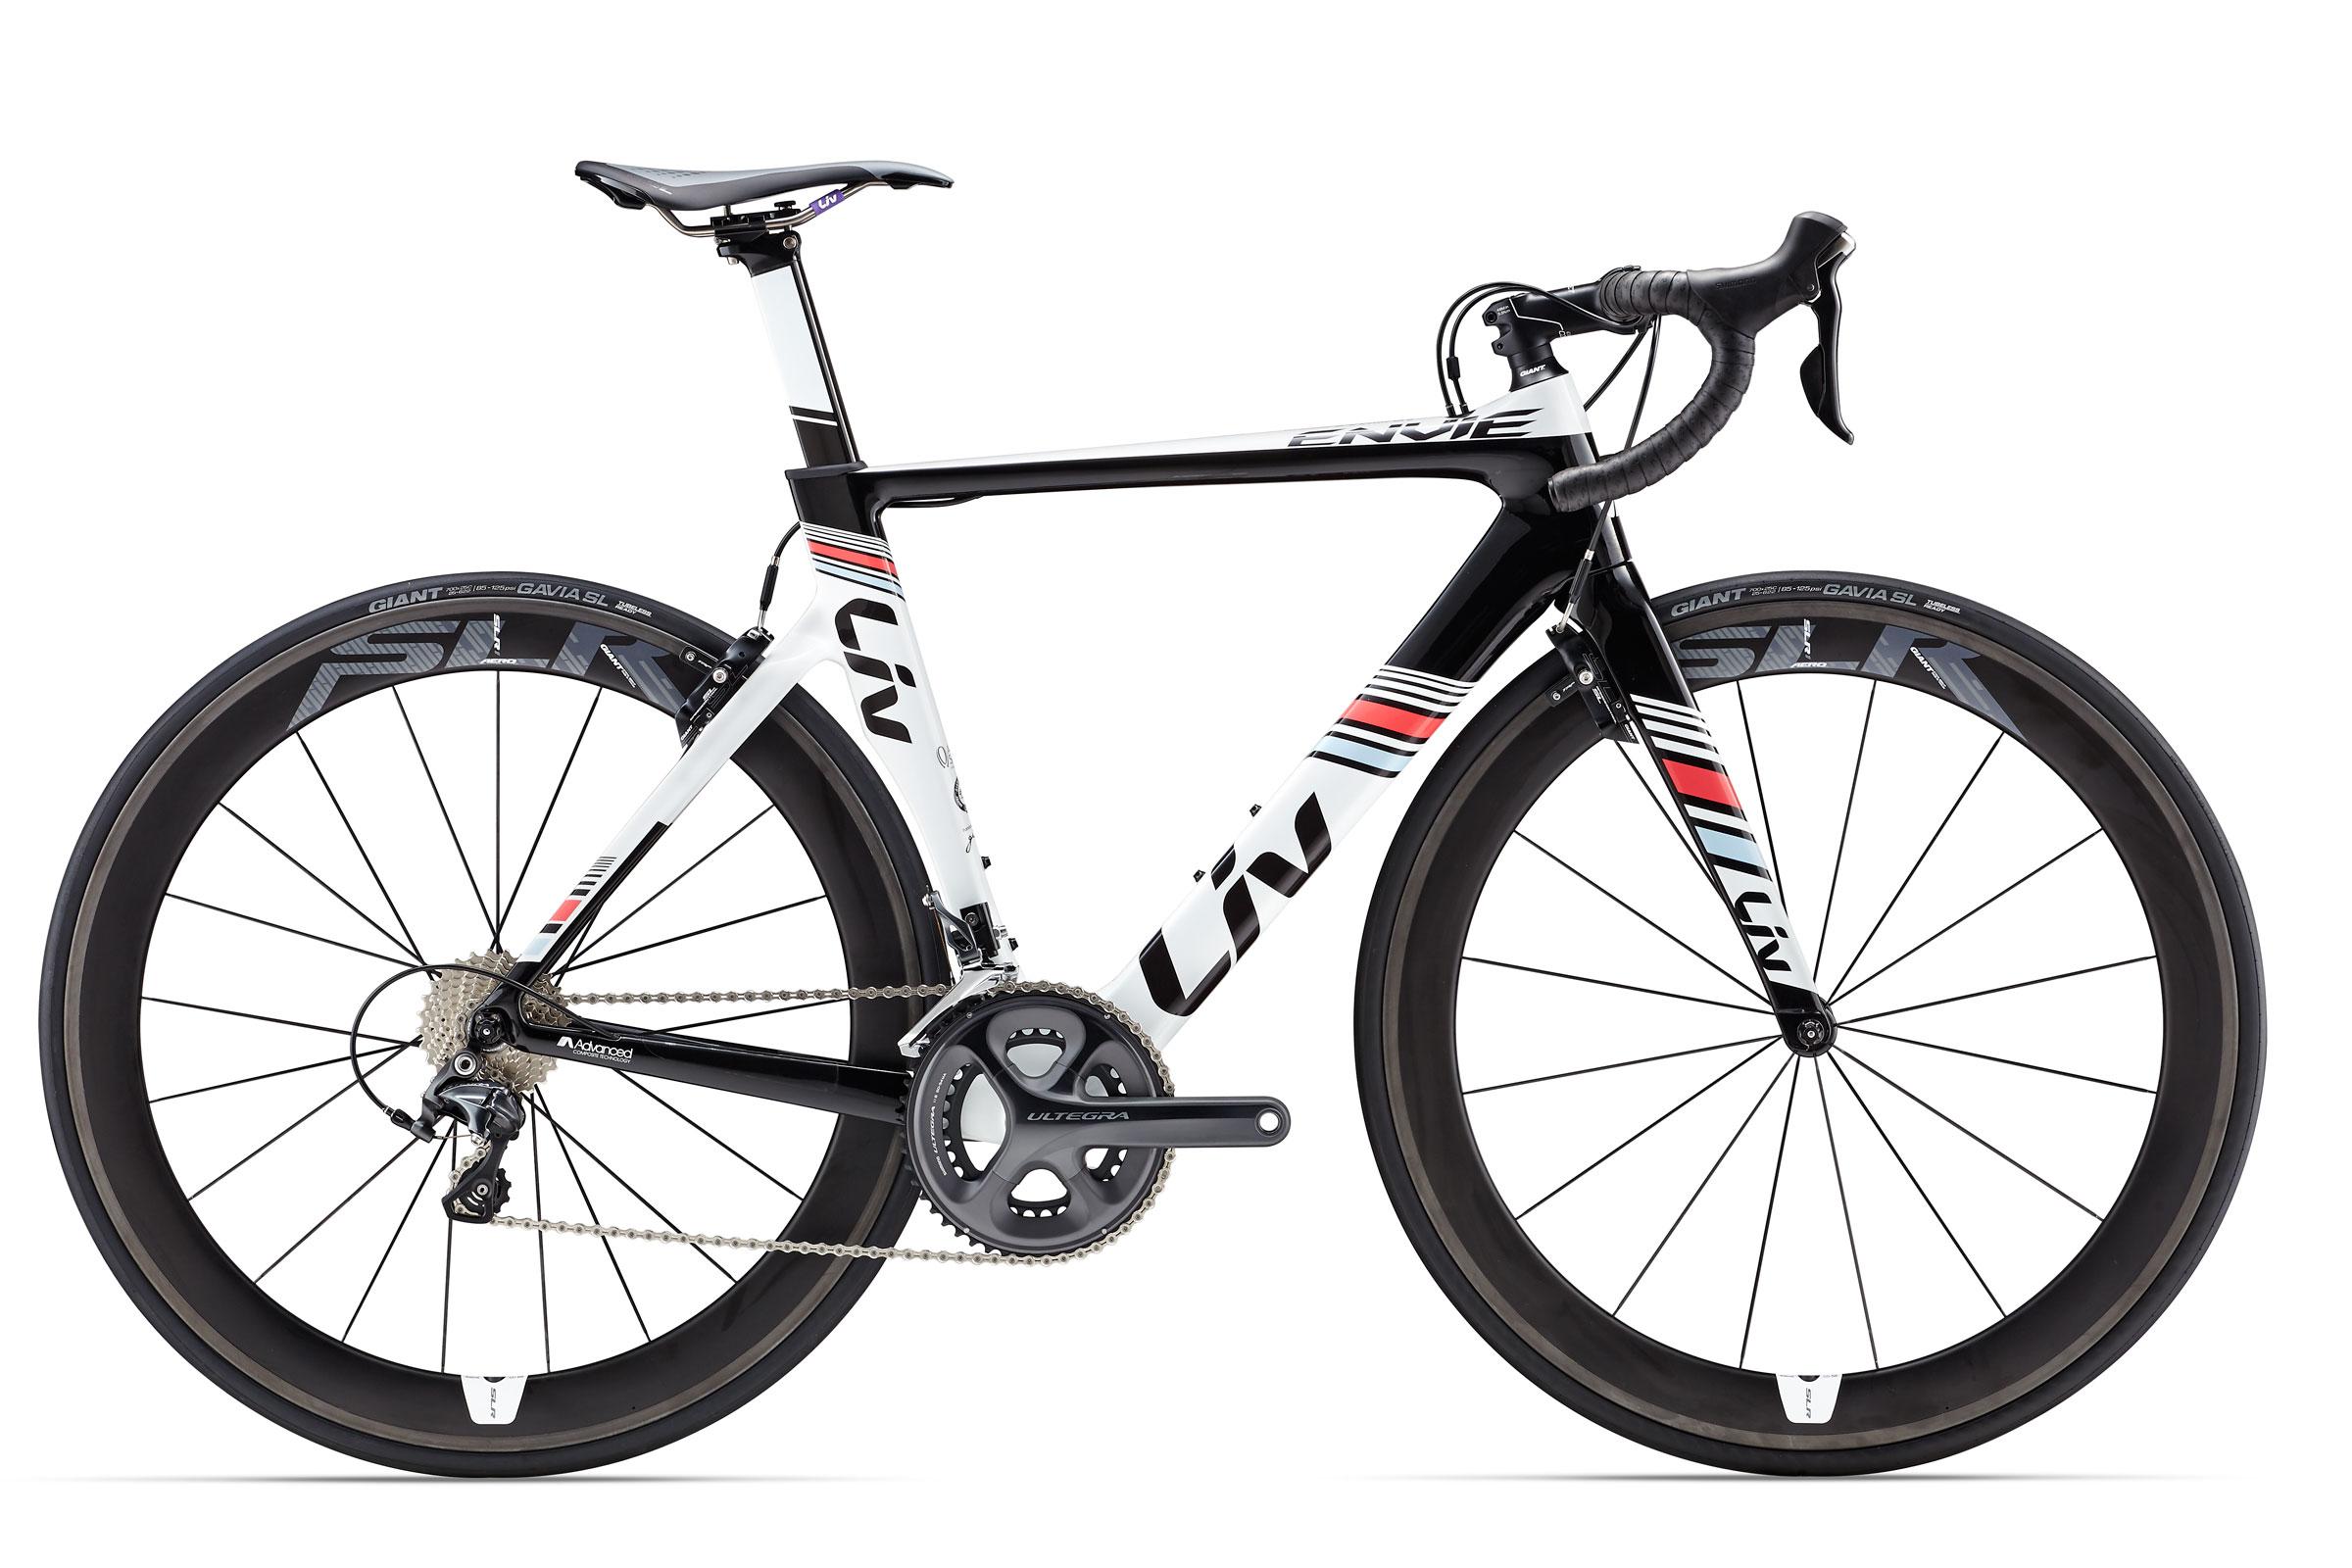 cab9c477bba Liv Envie Advanced 1+ - Bike Shop | Full Cycle